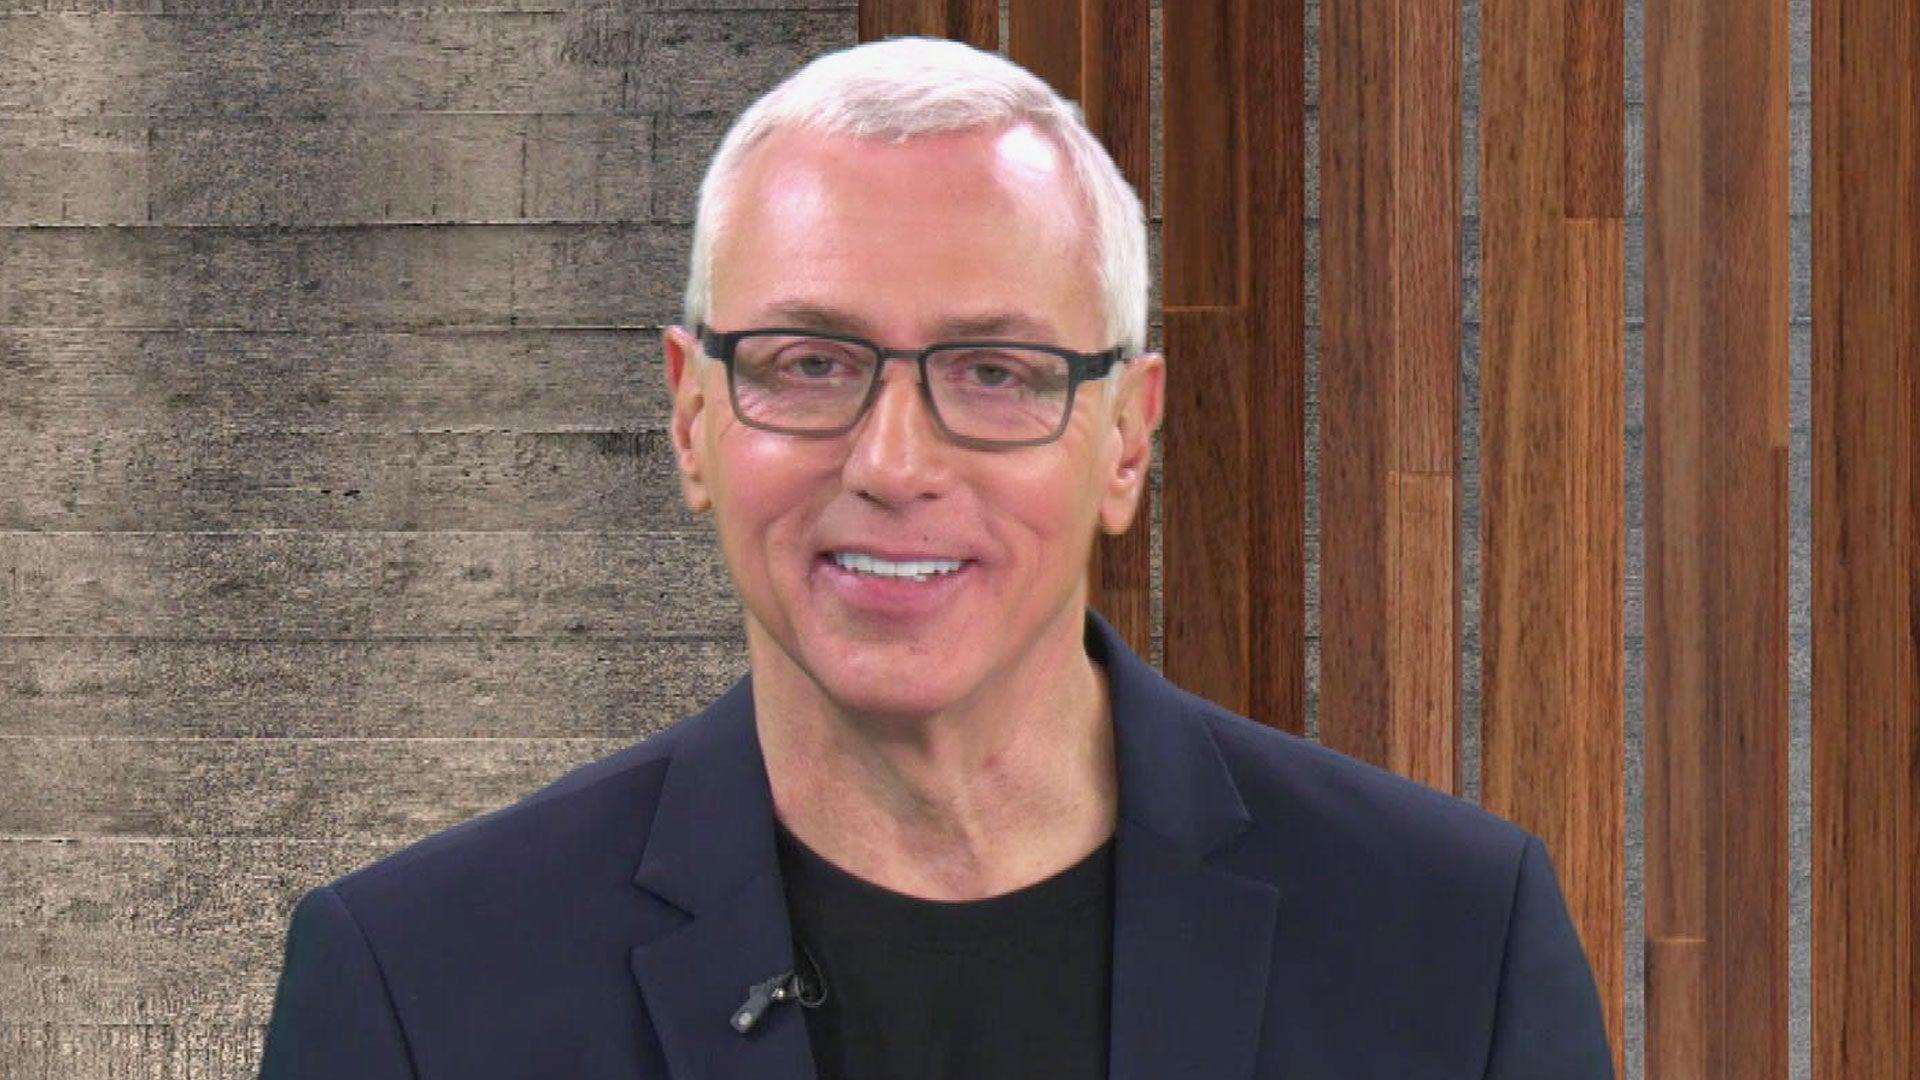 Dr. Drew Reveals Intense Security Measures Behind Keeping His 'Masked Singer' Secret (Exclusive)